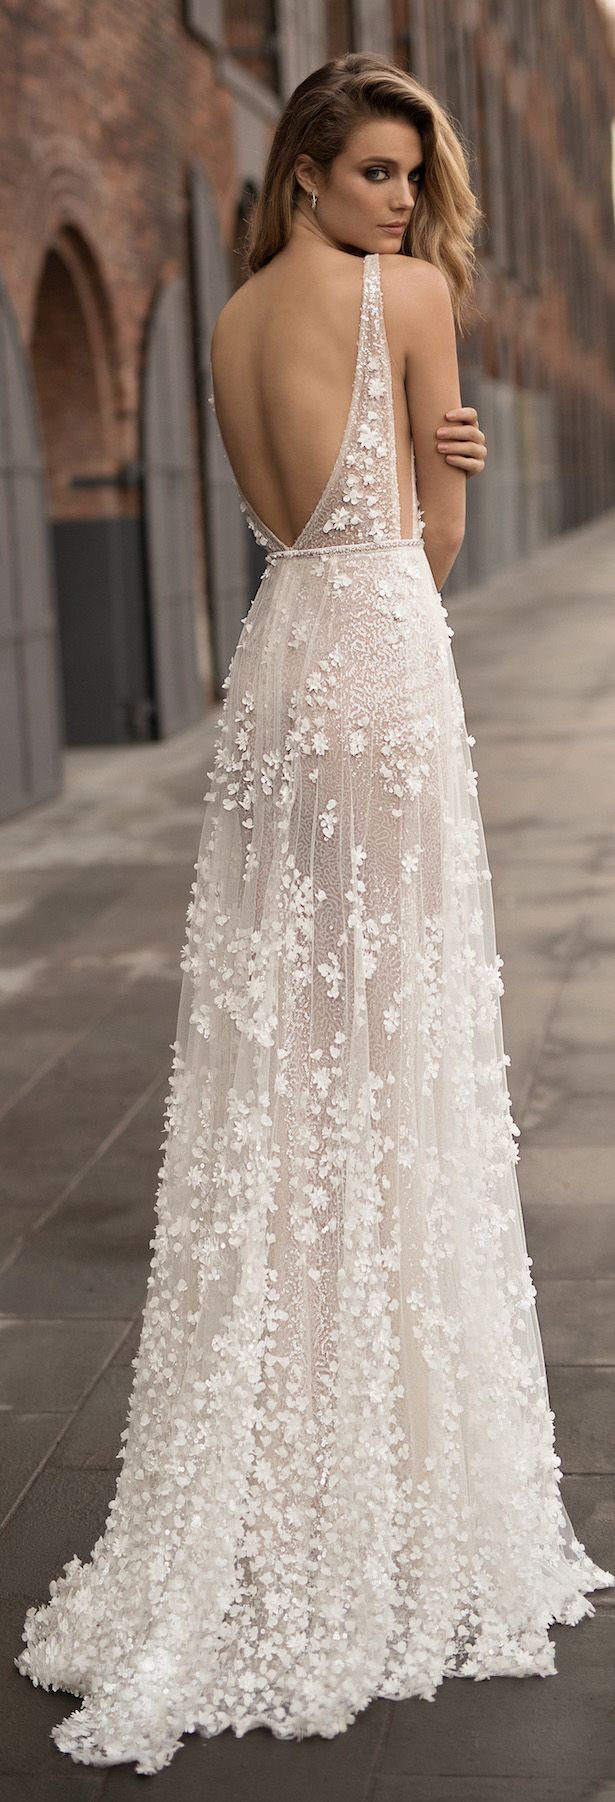 Berta wedding dress collection spring wedding dresses